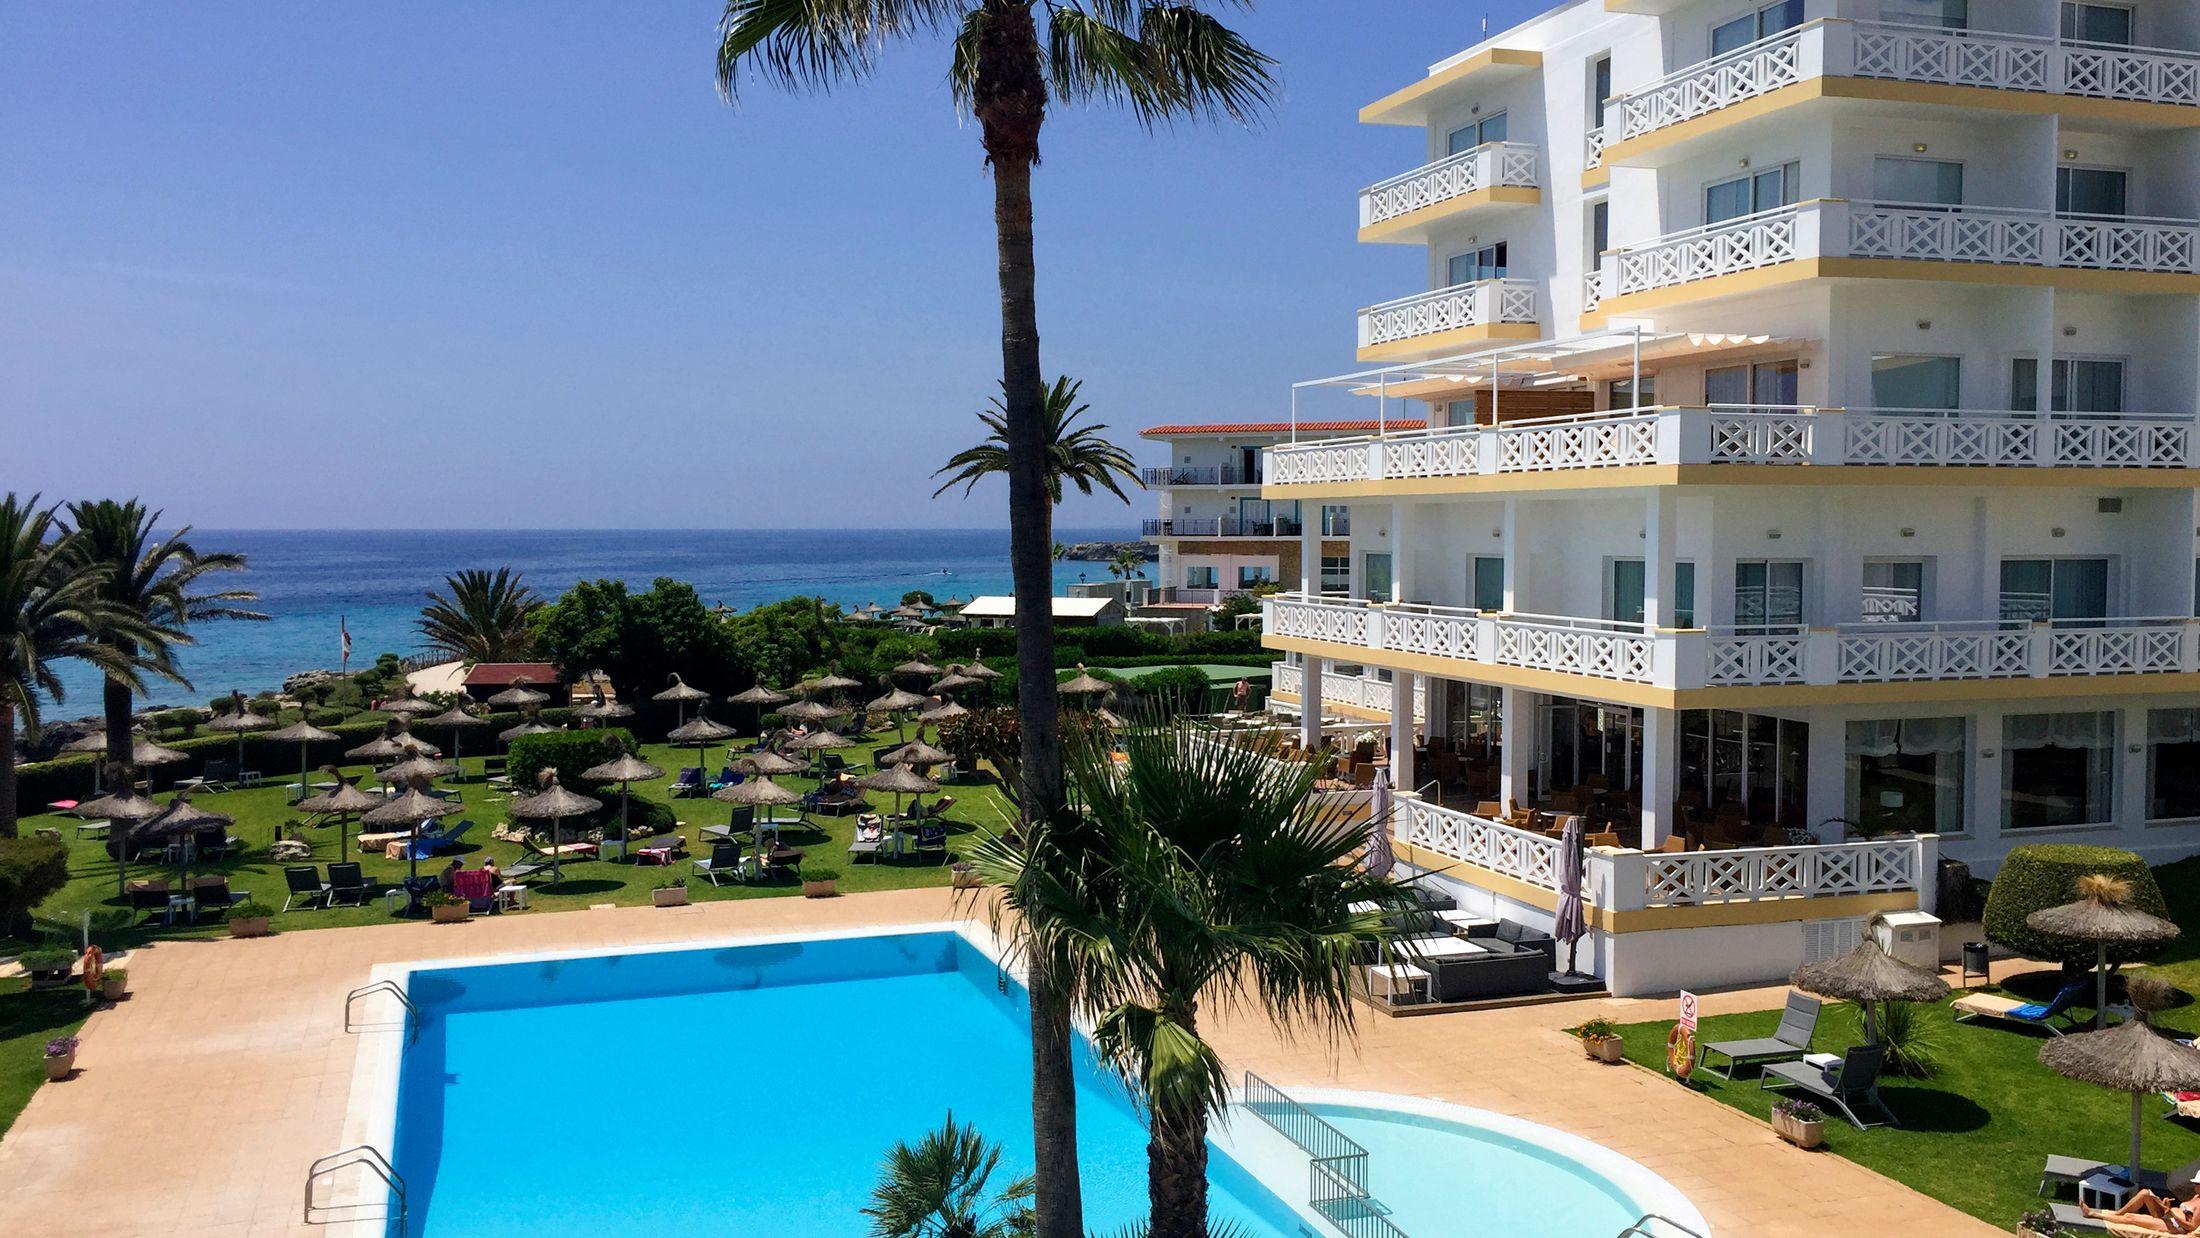 Luxury Menorca Holidays 2019/2020 | Sovereign